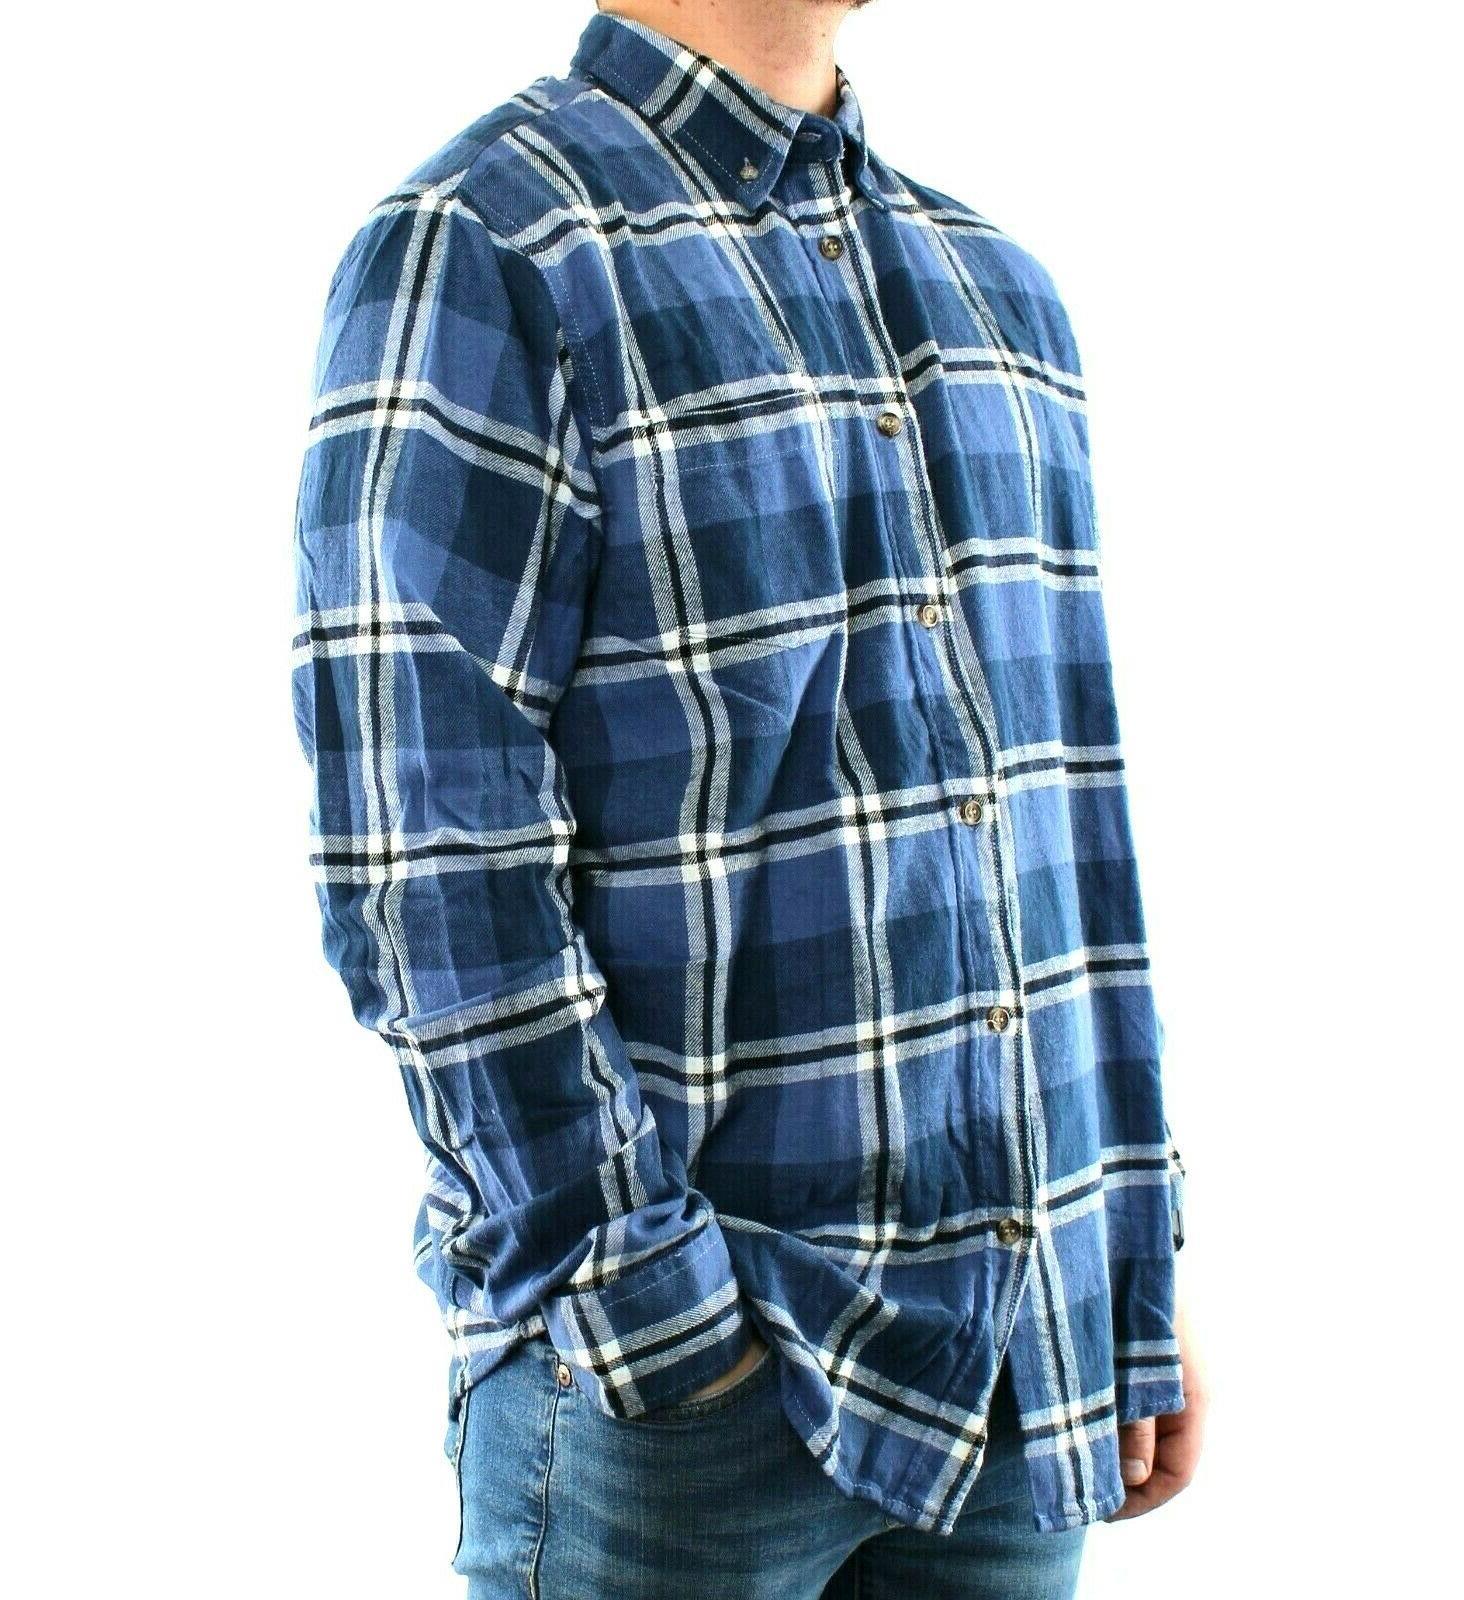 St. Bay Shirt Sleeve Down